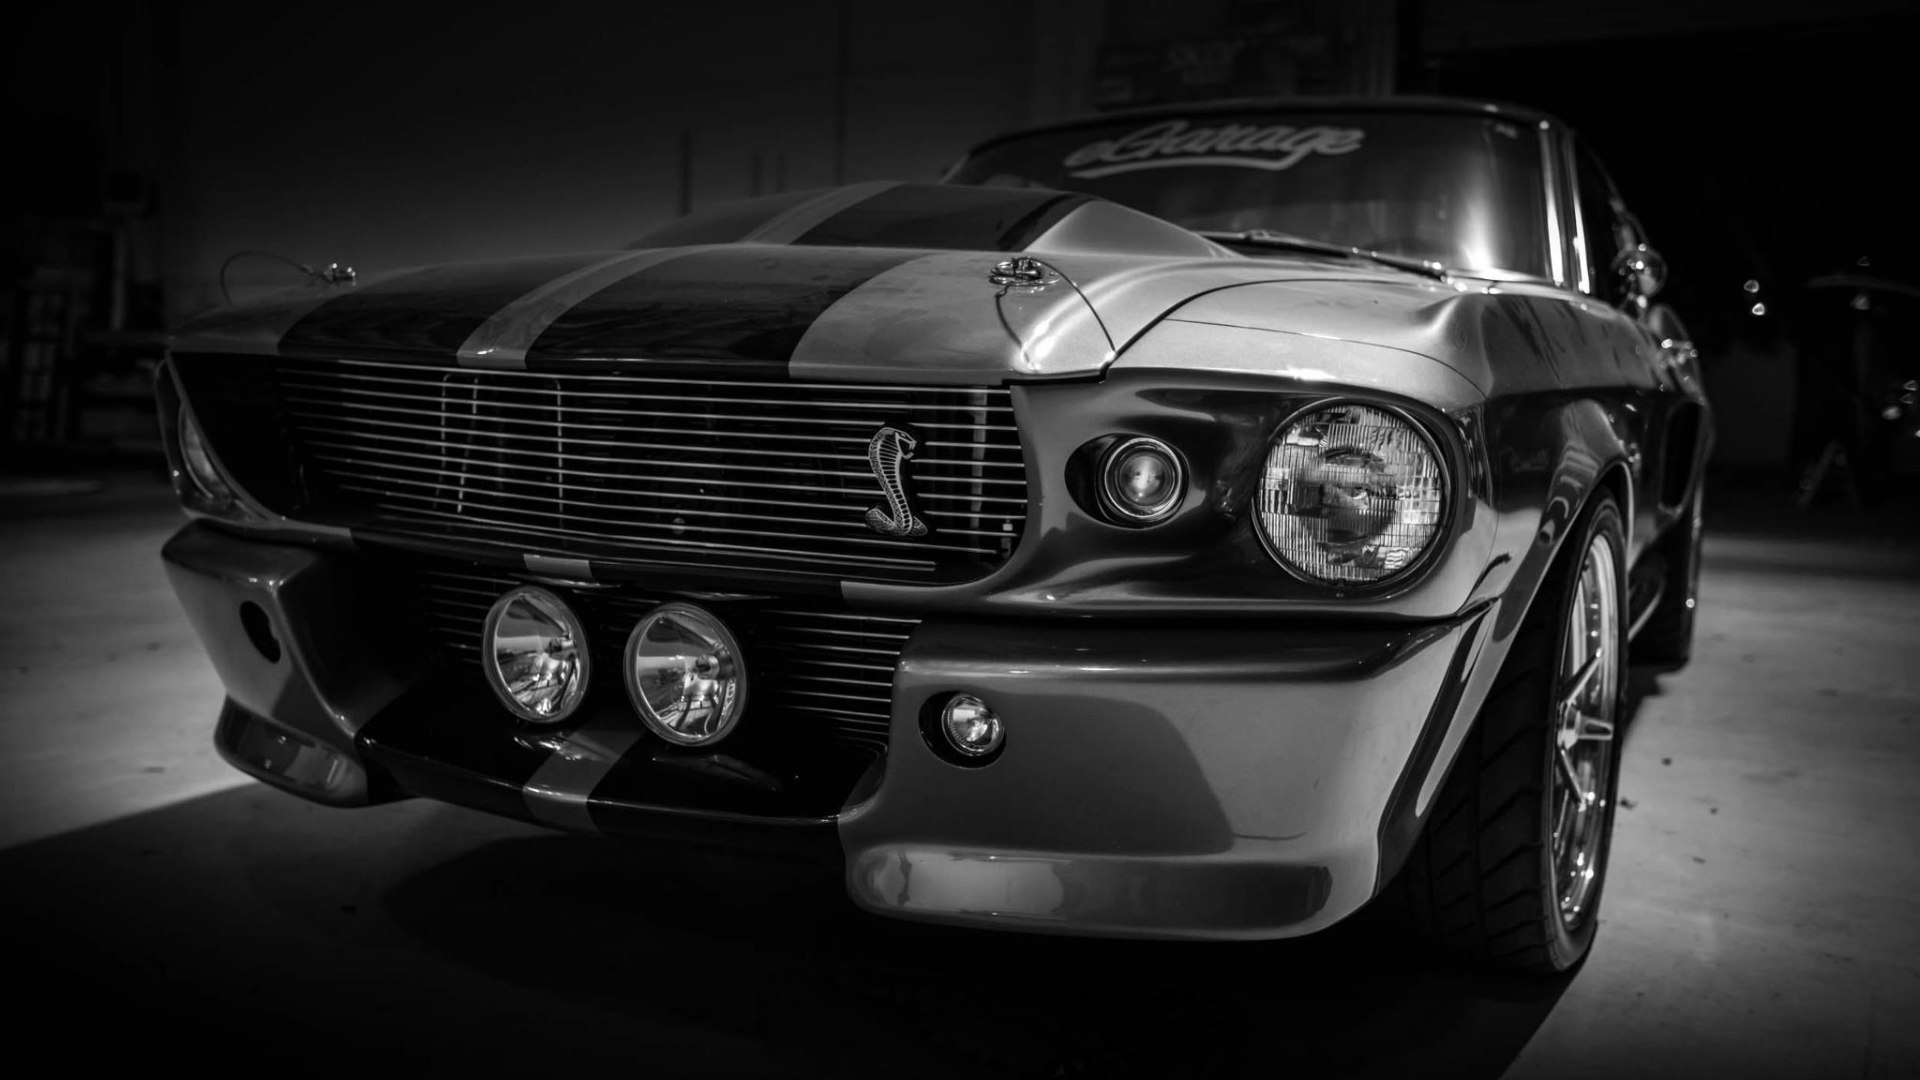 1967 Ford Mustang | eBay